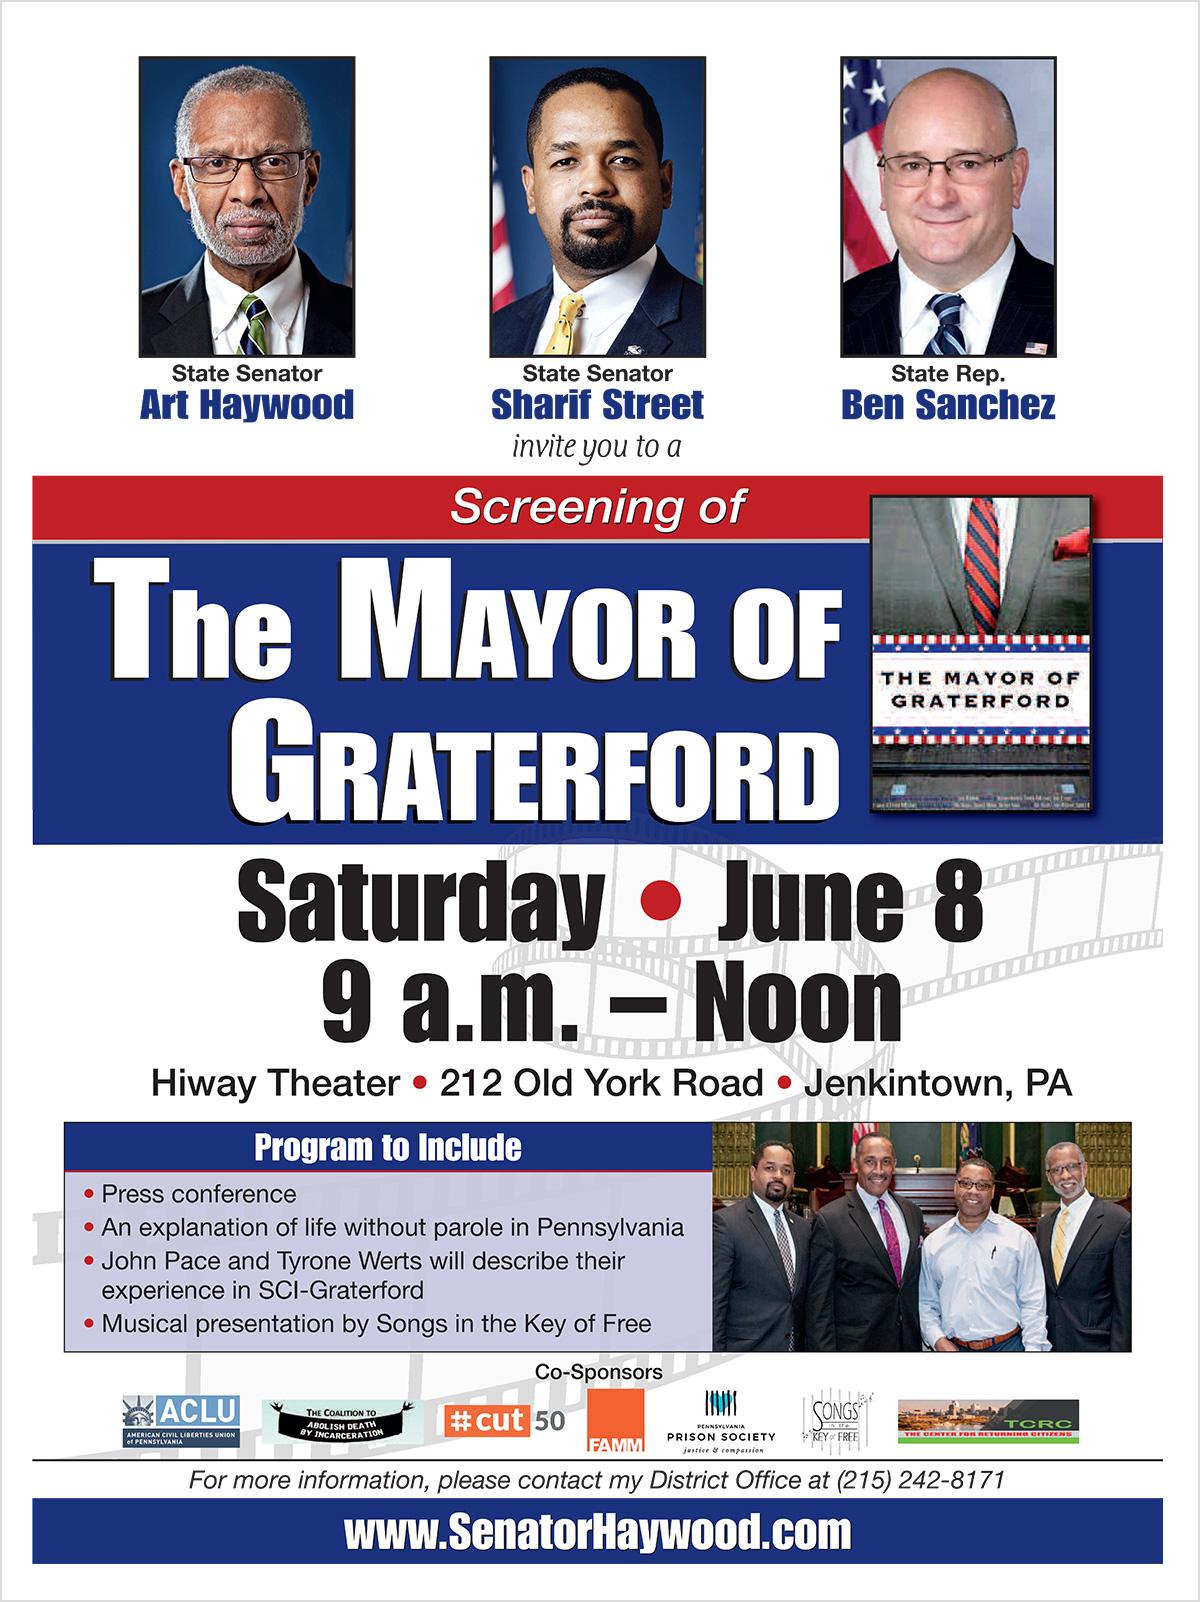 Screening of The Mayor of Graterford - Senator Art Haywood